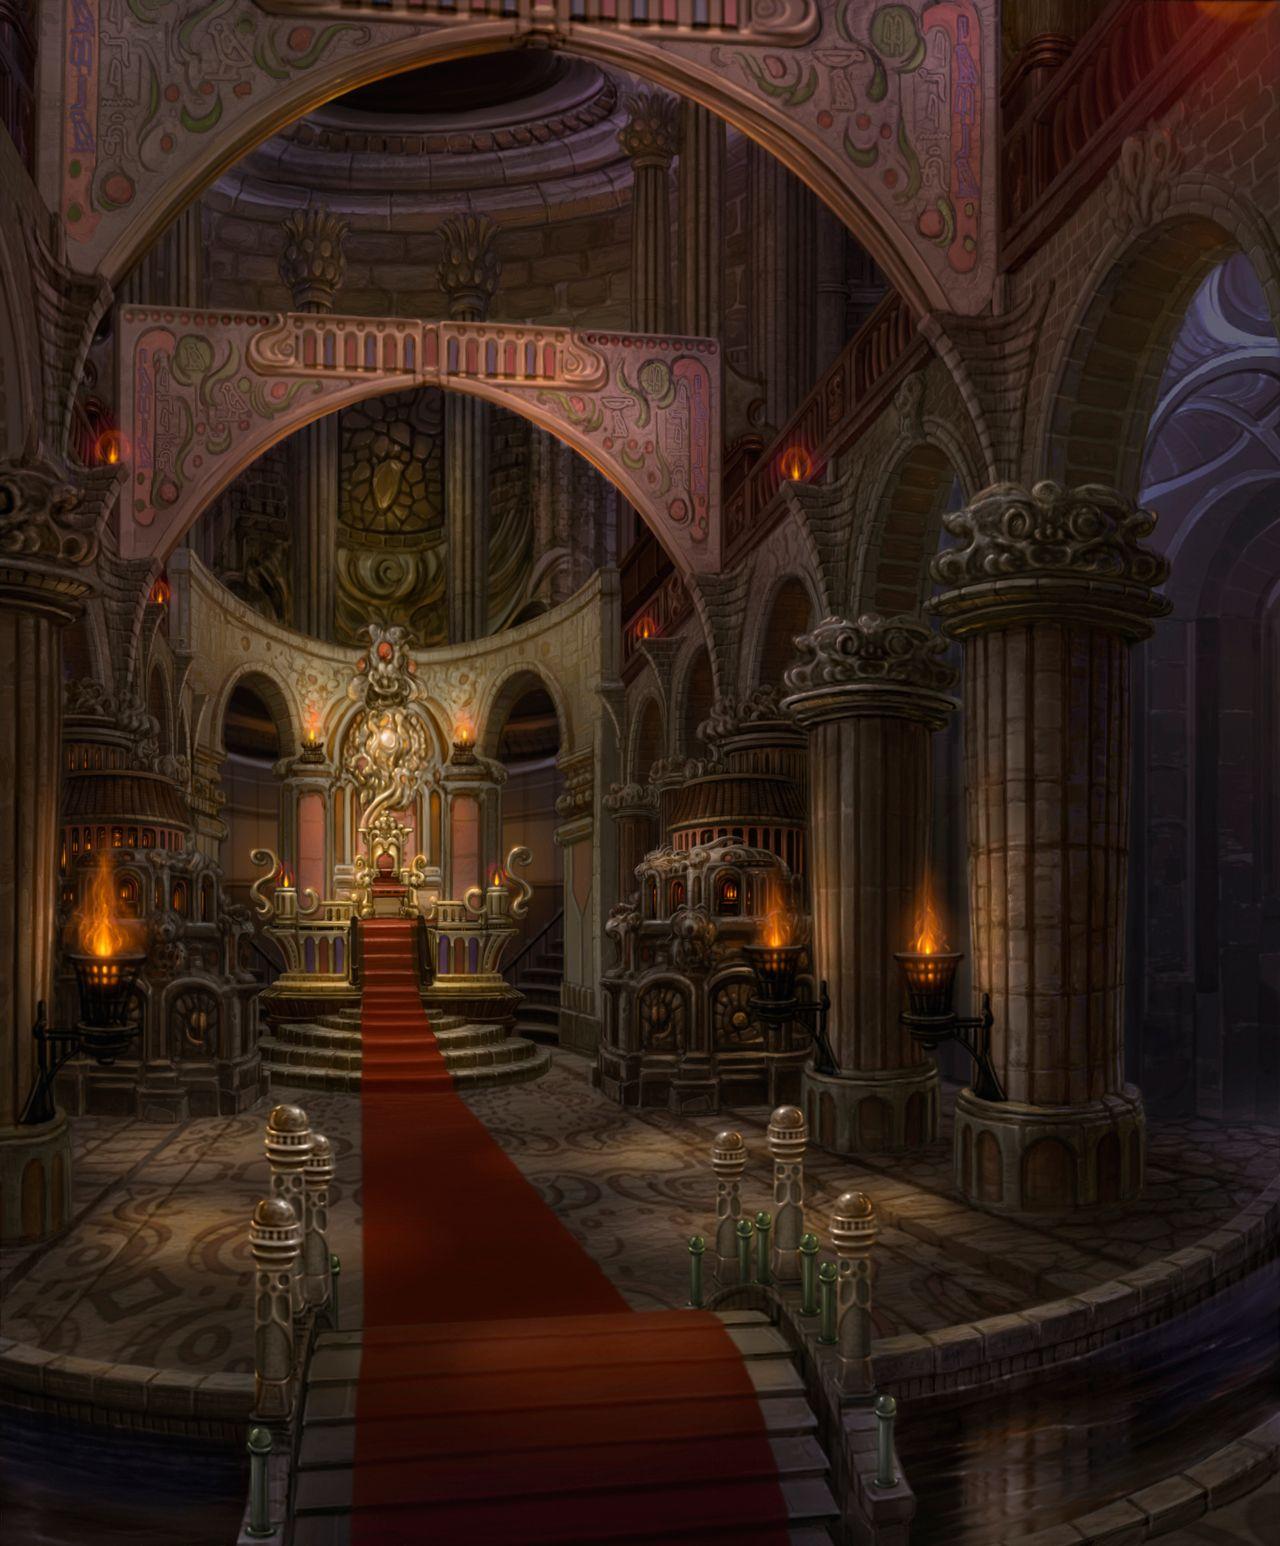 Evil kings throne room - Queen O S Throne Room The Art Of Animation Kazumasa Uchio